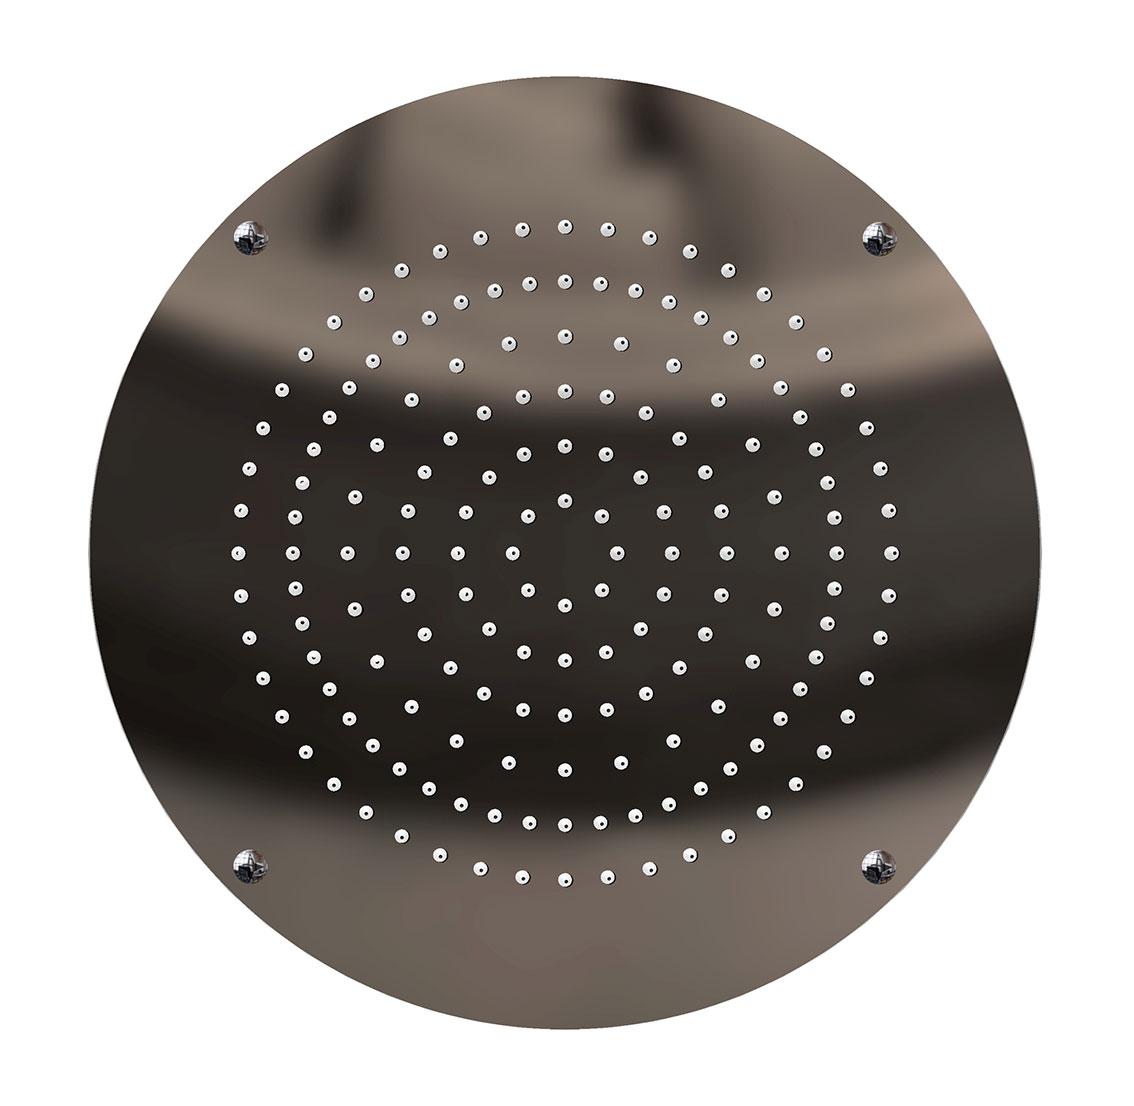 soffione-doccia-acciaio-inox-rotondo-ad-incasso-diam-350-2.jpg